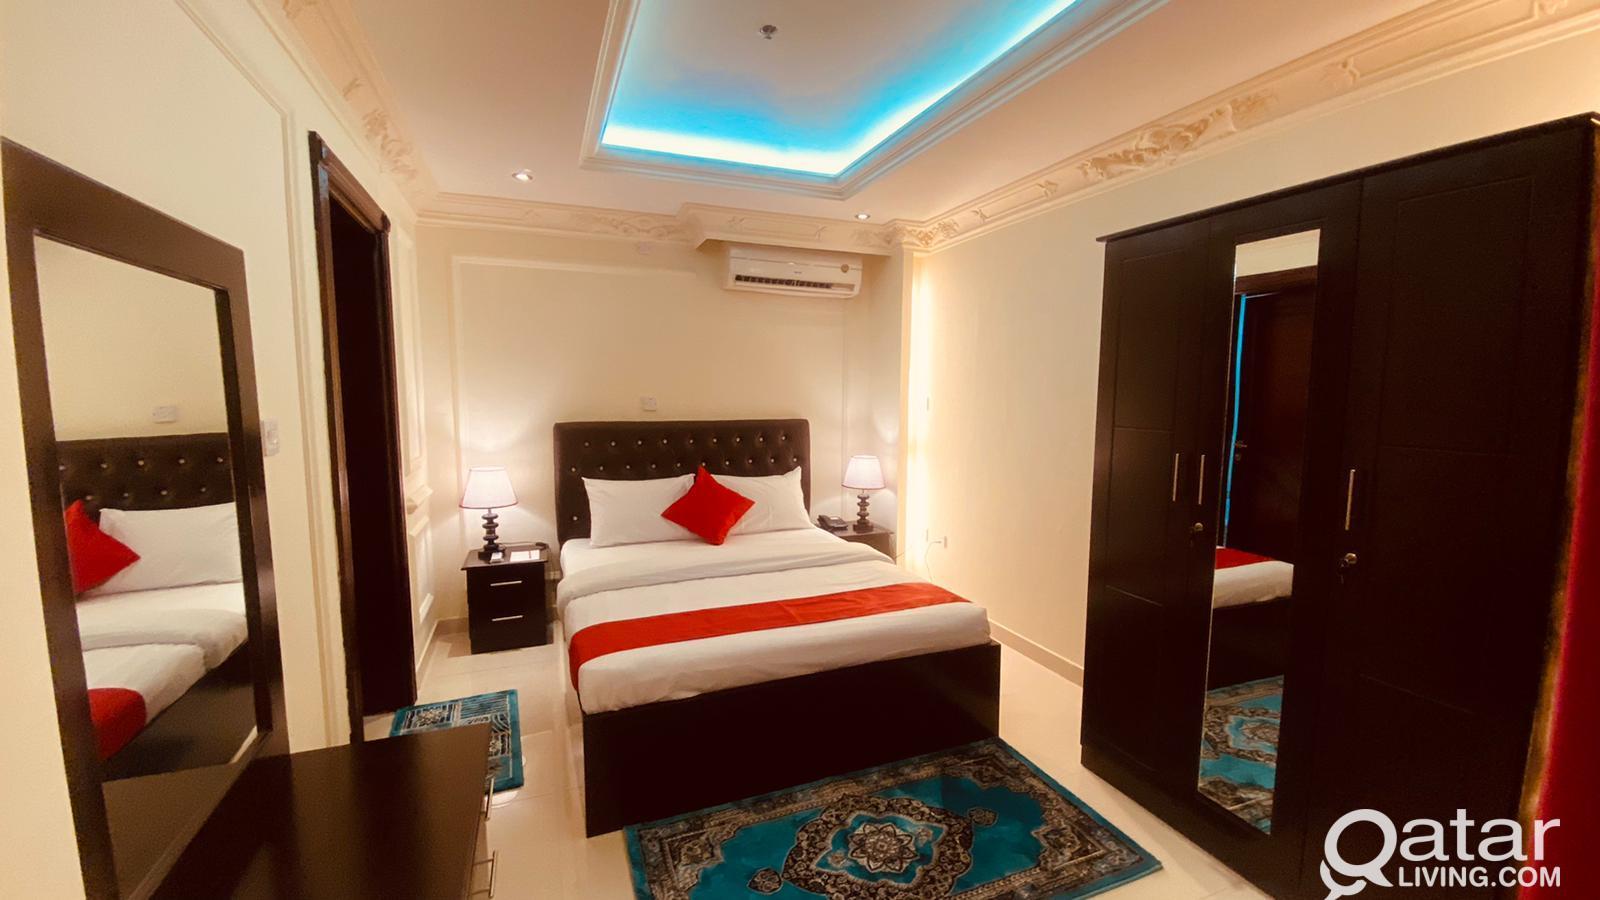 Offering F/F 1BHK Apartment Flat at Old Al Ghanim